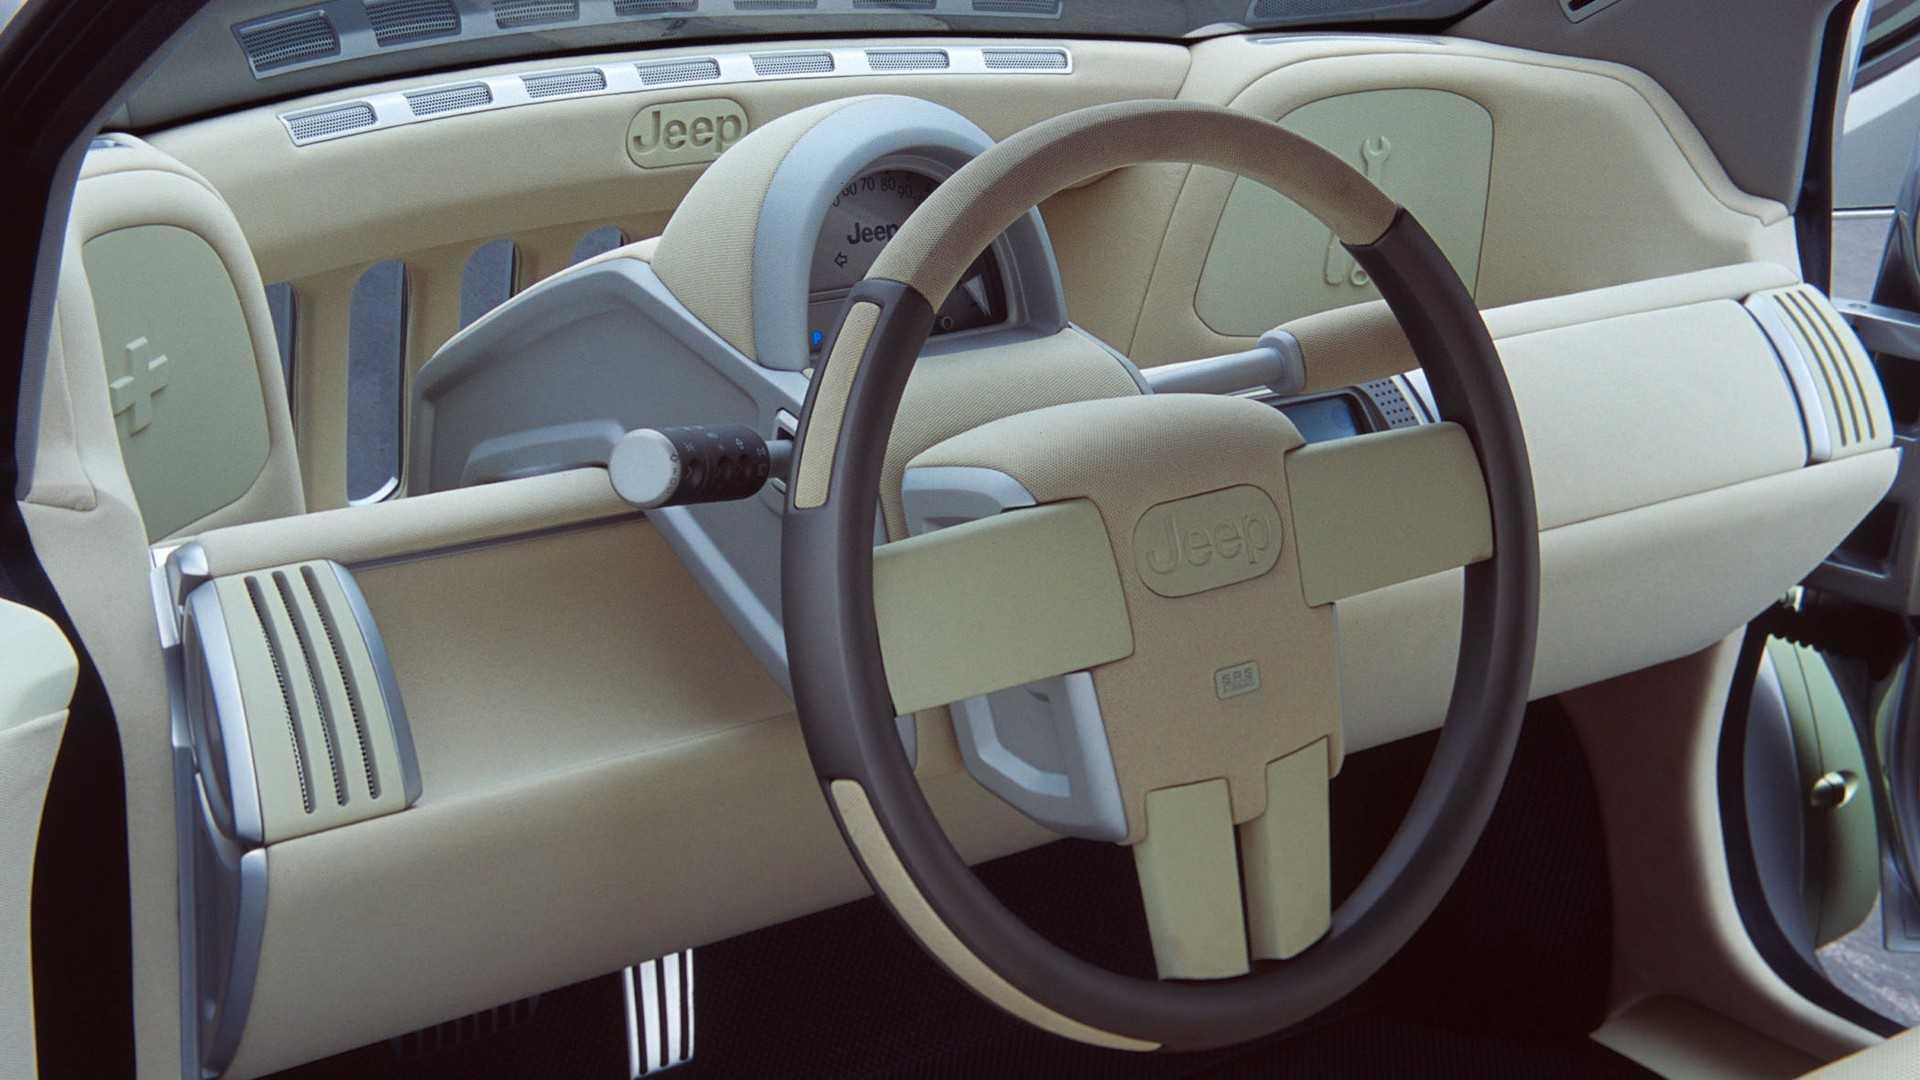 Jeep Treo concept 2003 (22)